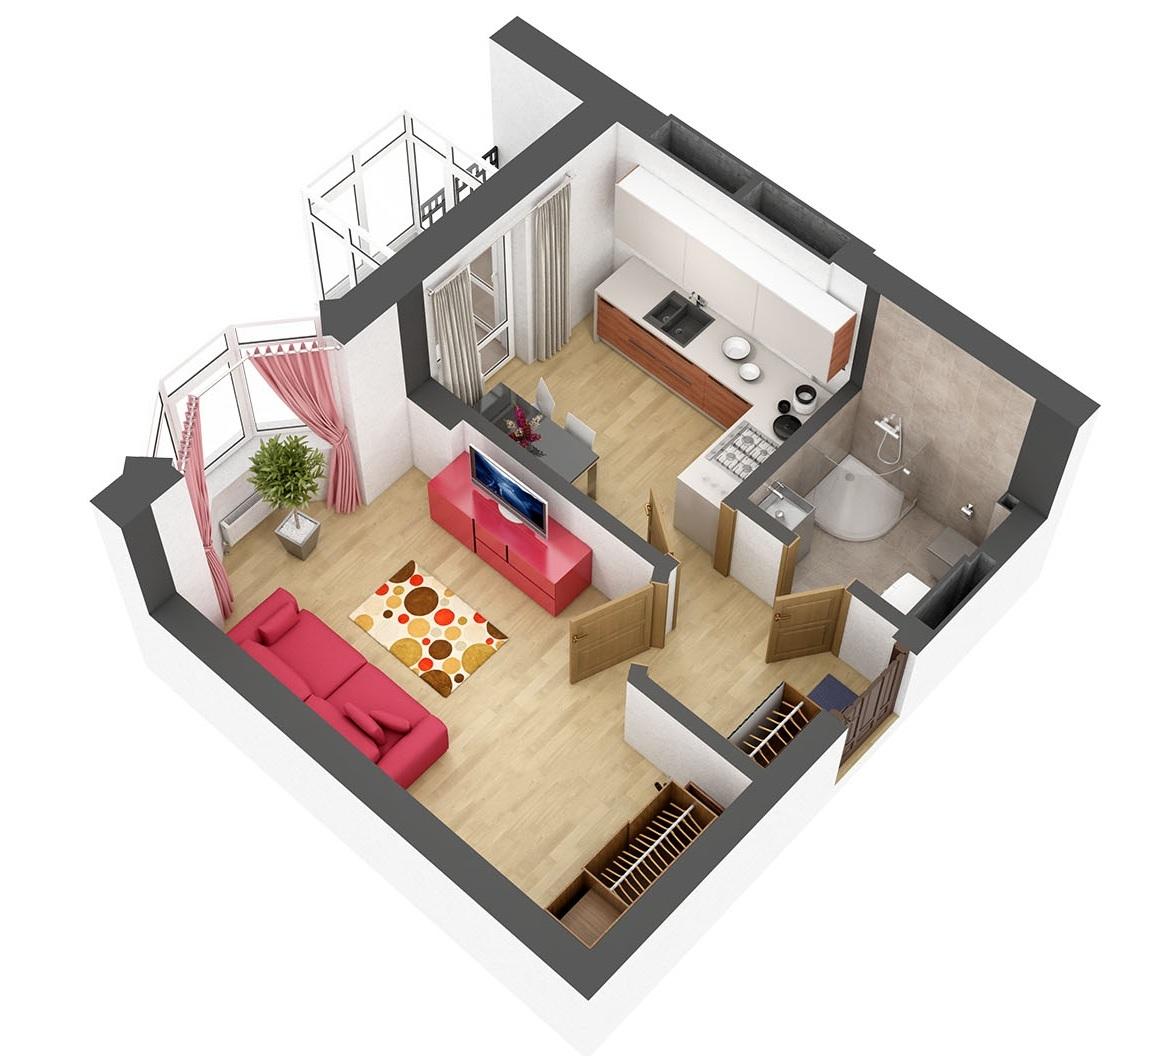 ЖК Гранд Бурже Буча вариант планировки однокомнатной квартиры